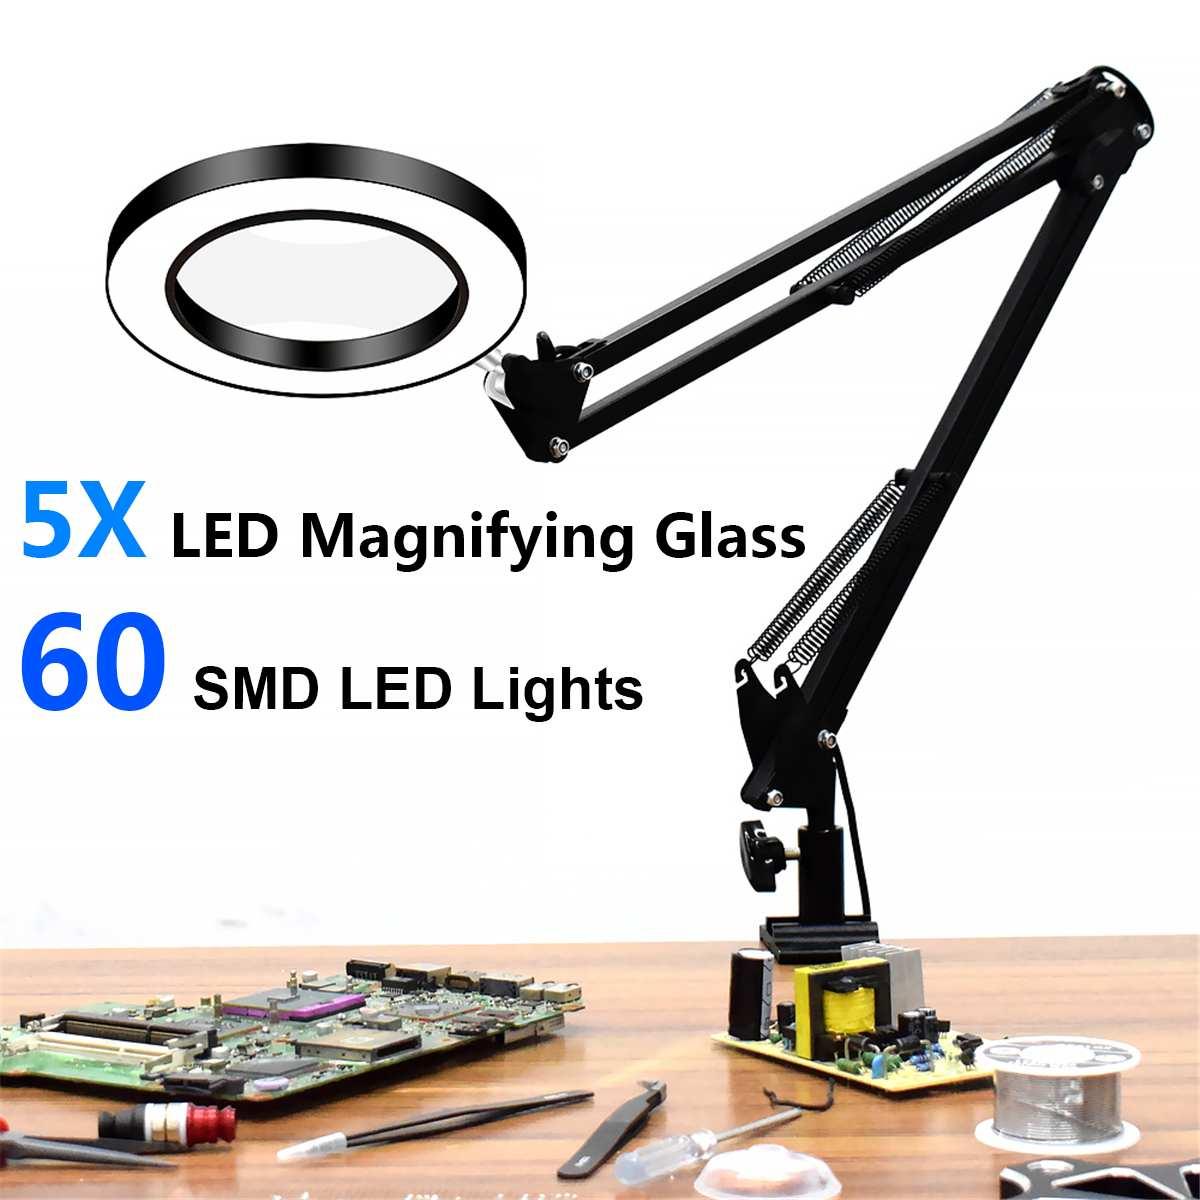 8W USB LED 3 ألوان الجدول مصباح يعتم مكتب القراءة ضوء 60 SMD LED أضواء مع 5X كبيرة المكبرة الزجاج المكبر مسمار الجمال